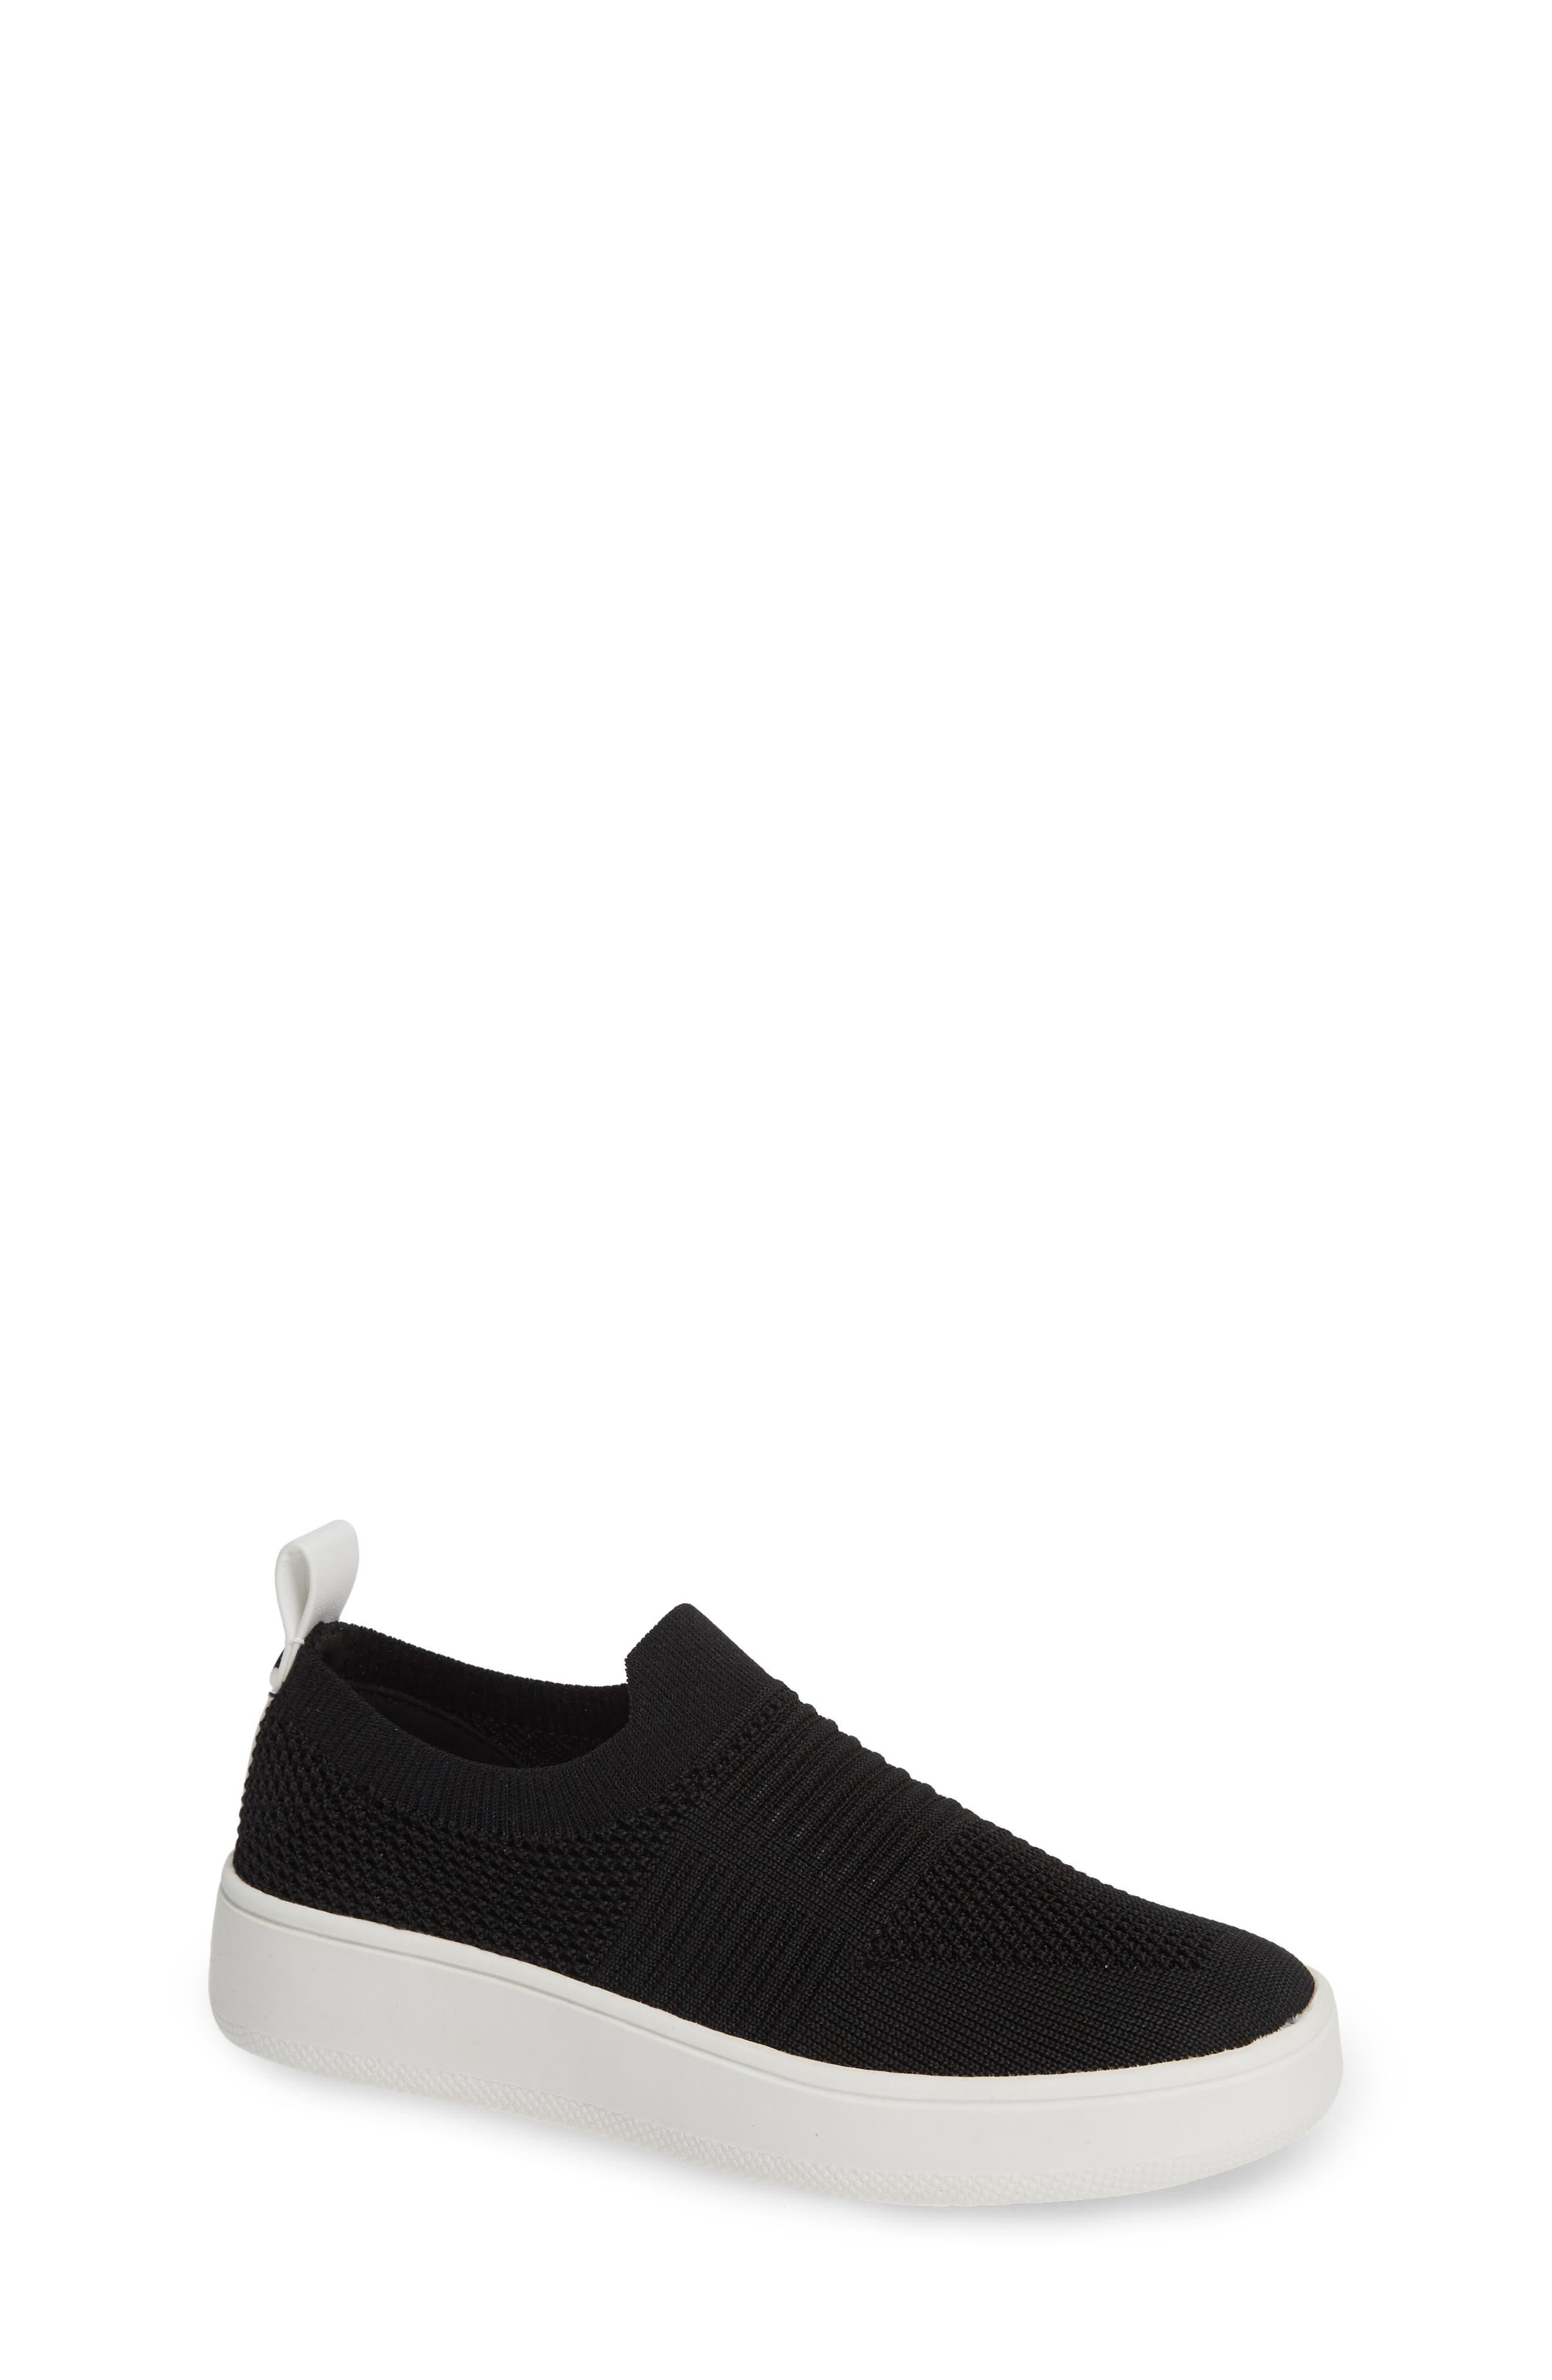 JBEALE Knit Slip-On Sneaker, Main, color, 017